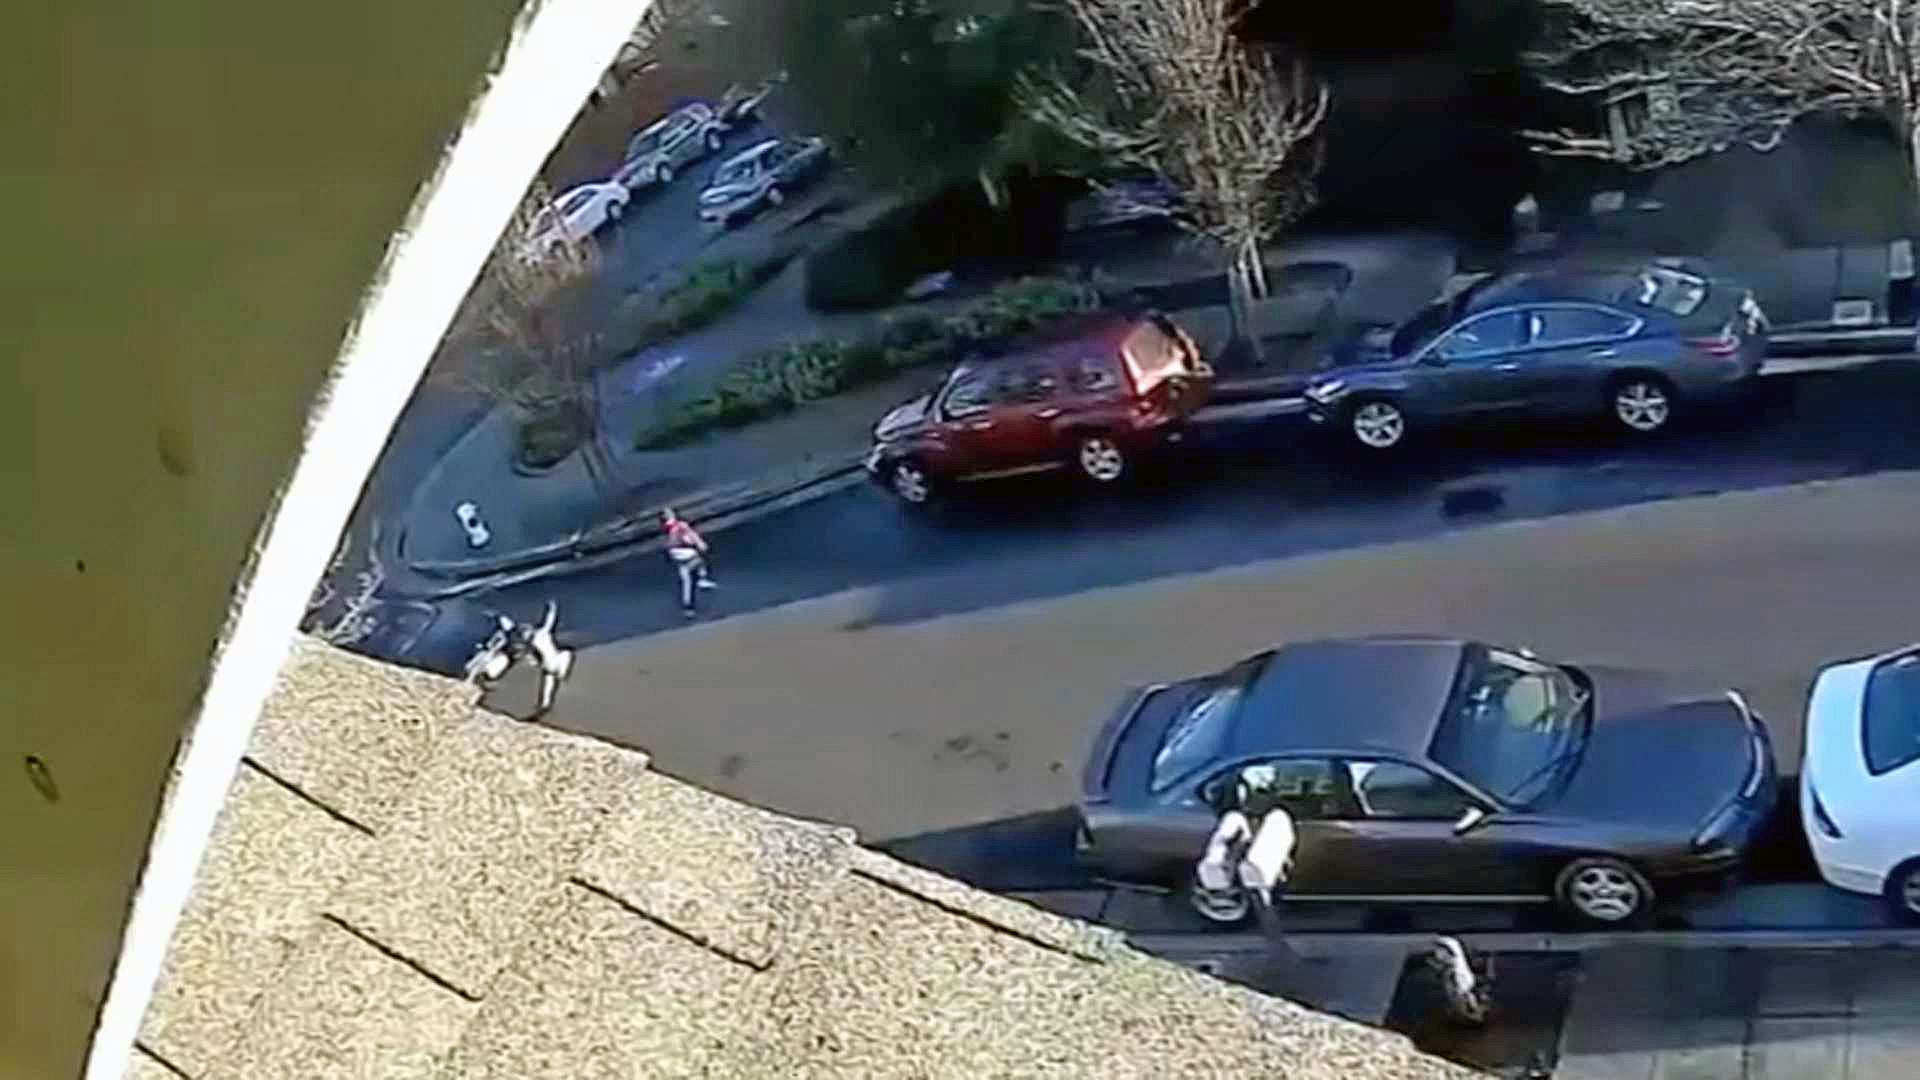 Police Search For Driver Who Hit Girl, 7, in Santa Rosa